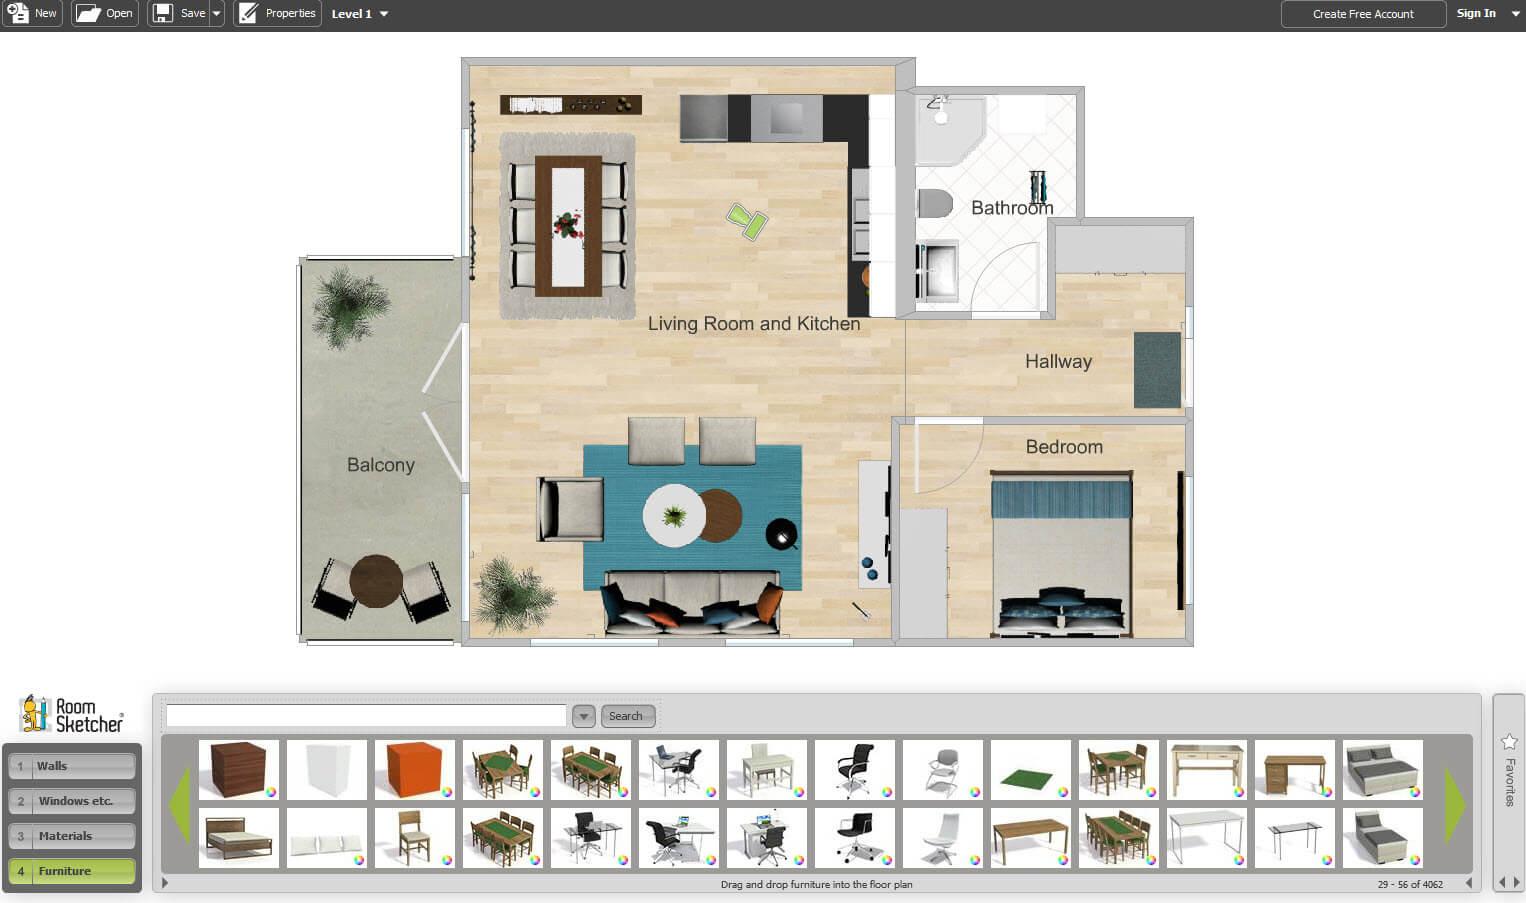 Room Sketcher creates house plans online